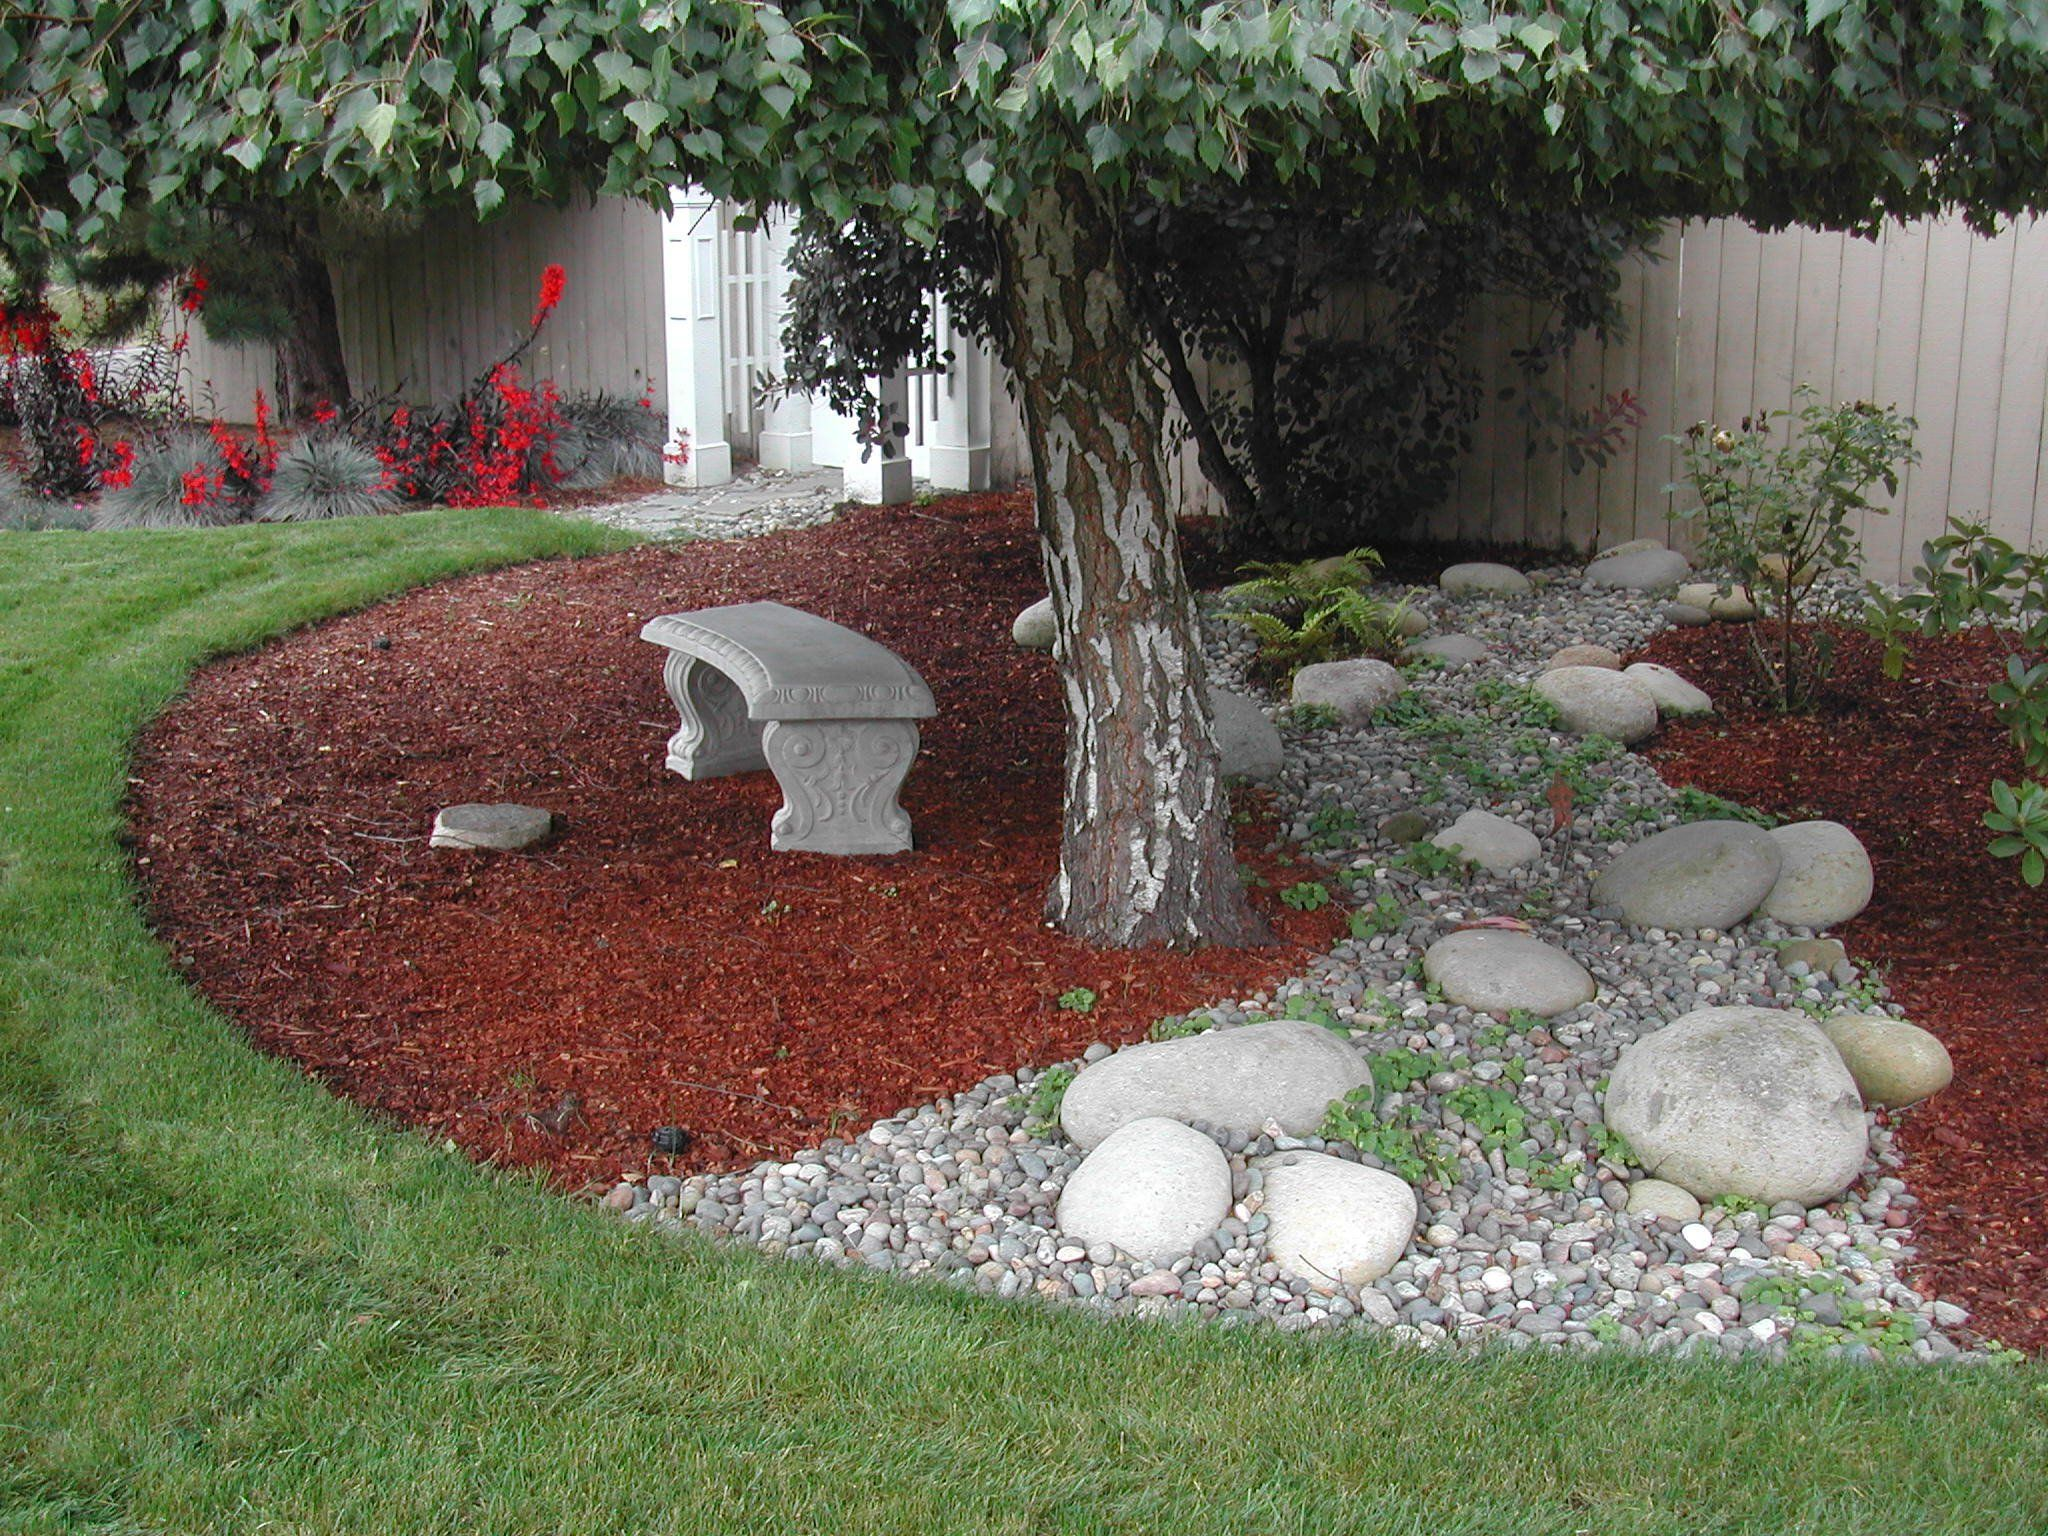 tree bark in landscape design garden and outdoors pinterest